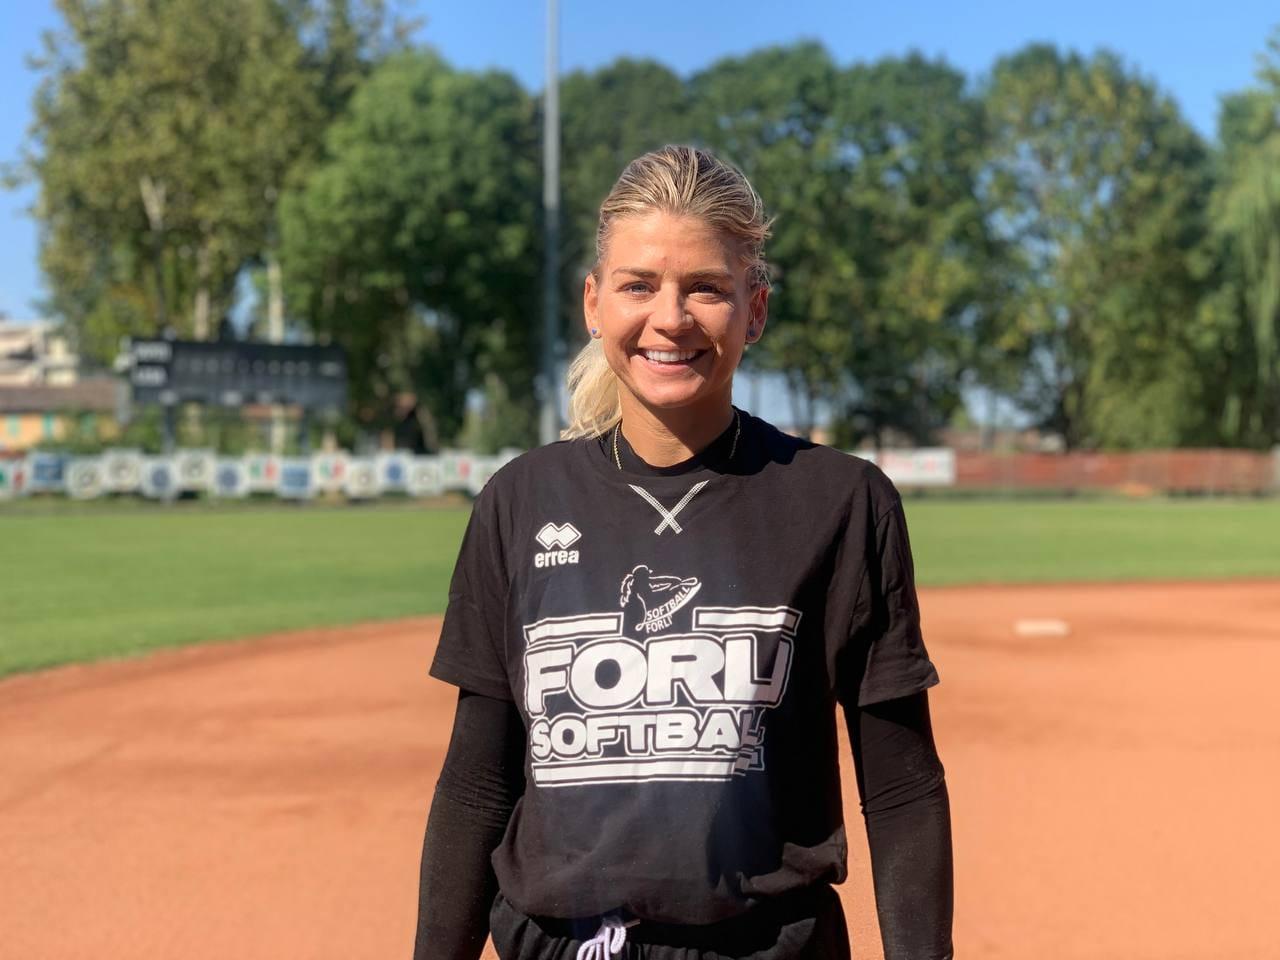 Samantha-Leigh-Sheeley softball Poderi Dal Nespoli Forlì